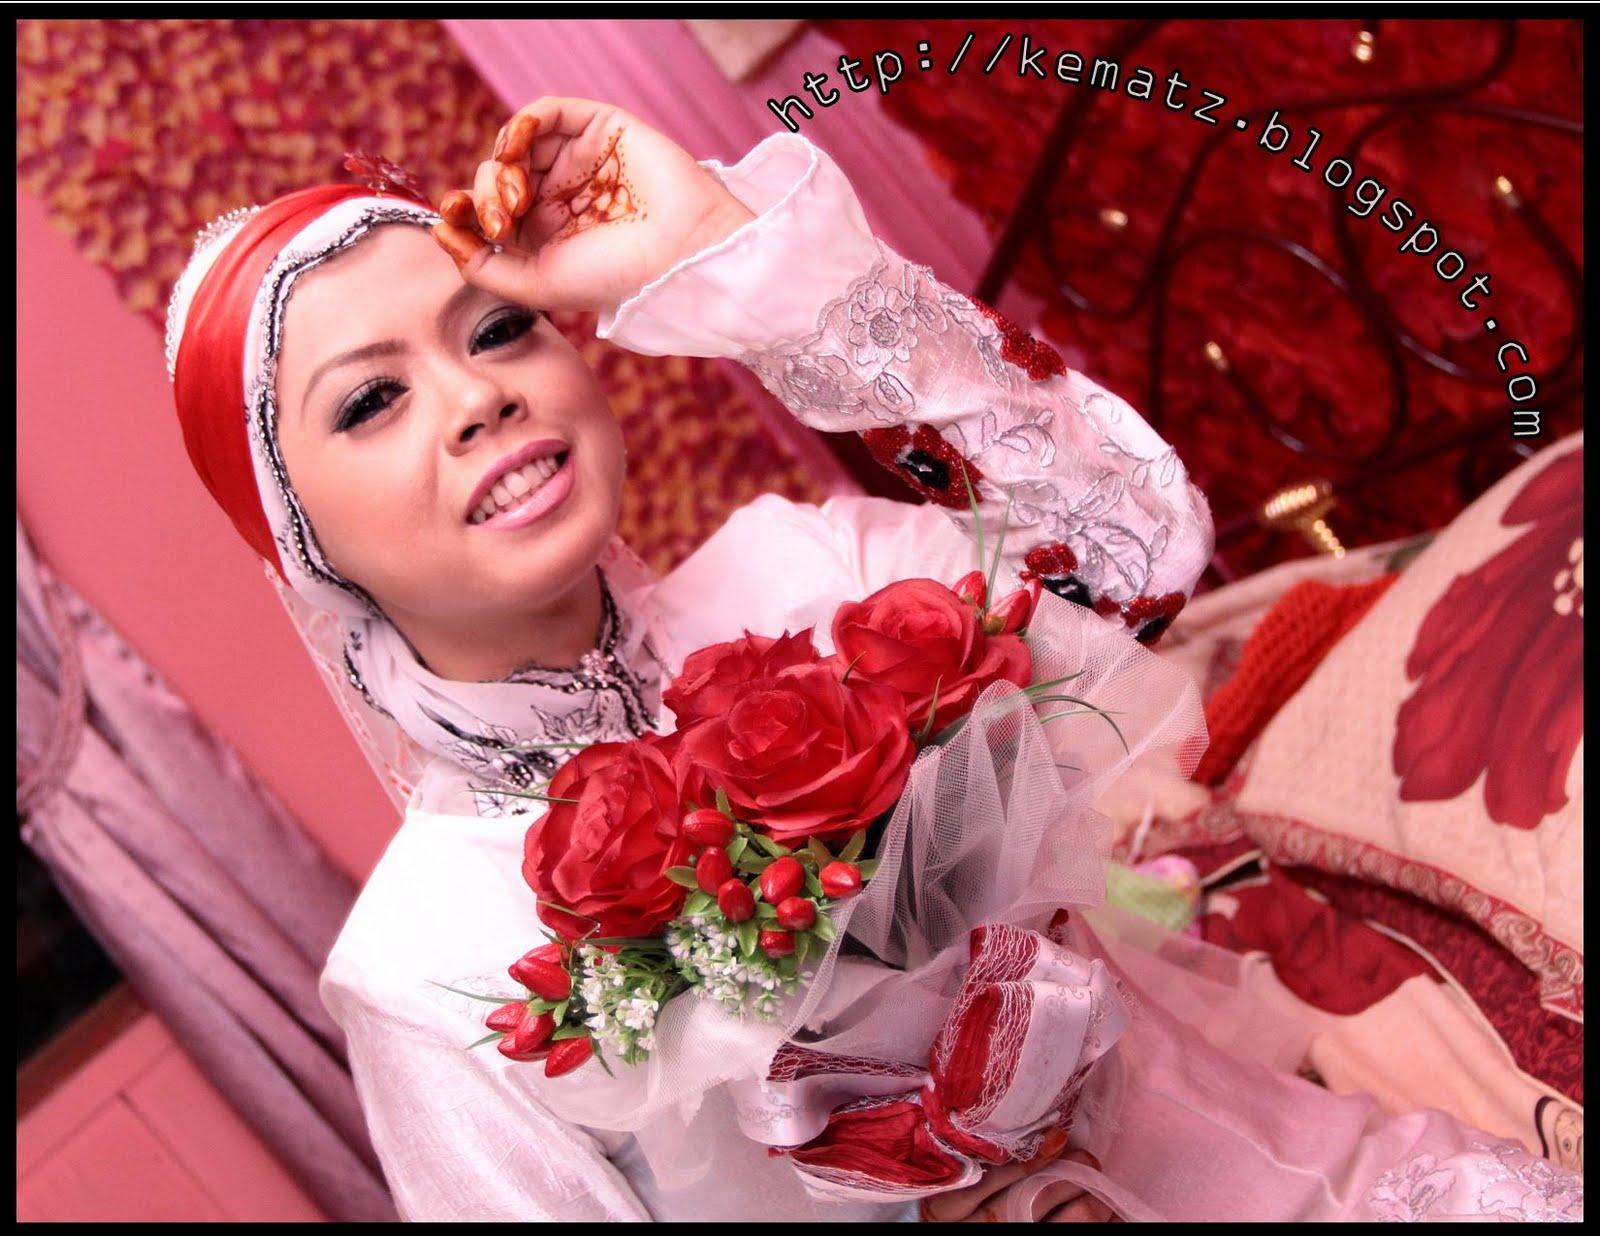 HampeH DoT CoM ZonE Majlis Pernikahan NoraJoey Amp Afiez